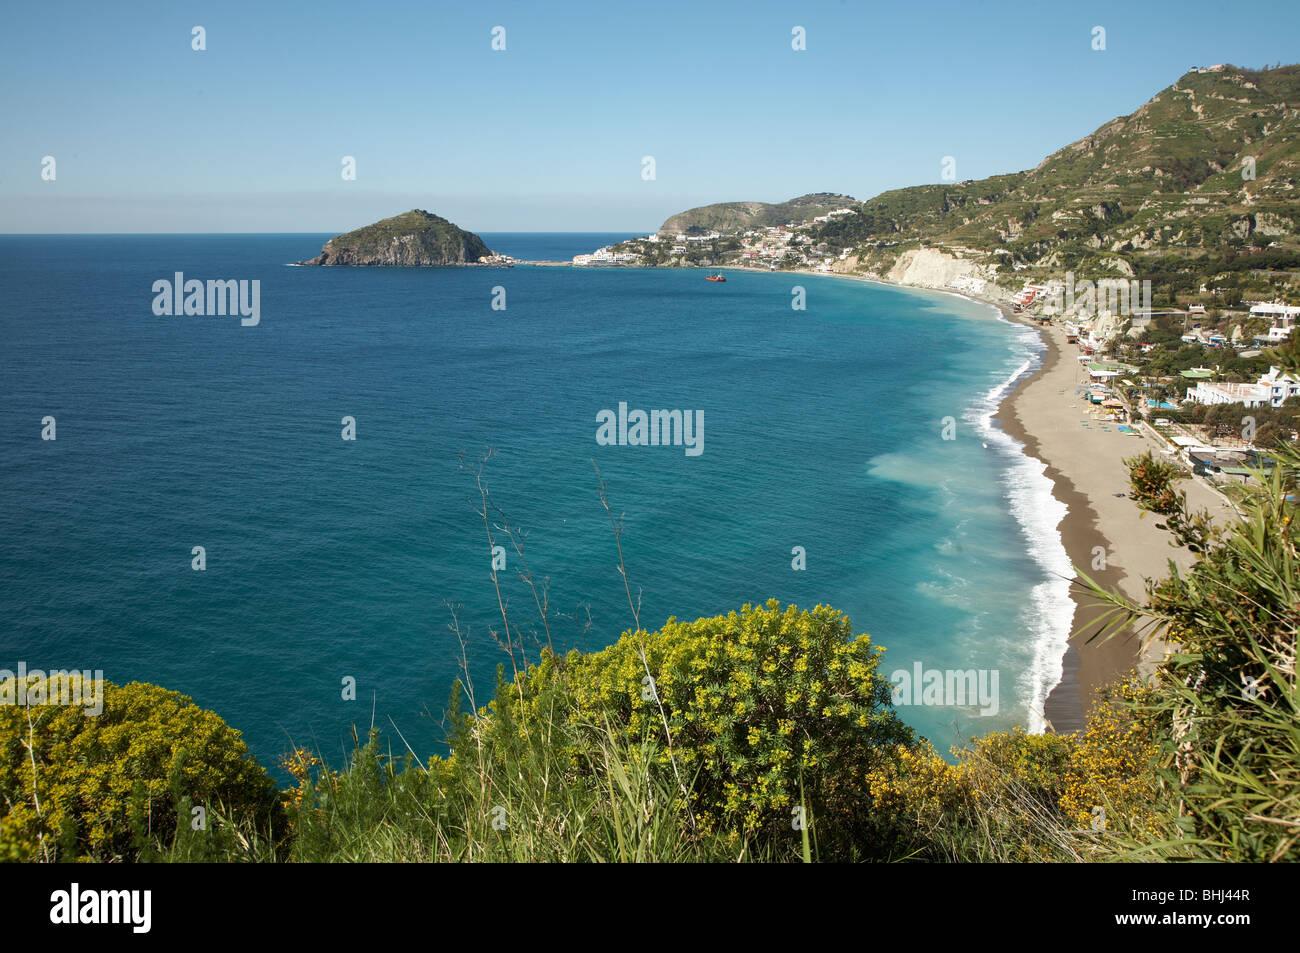 Ischia island, Italy: view of Lido dei Maronti beach - Stock Image